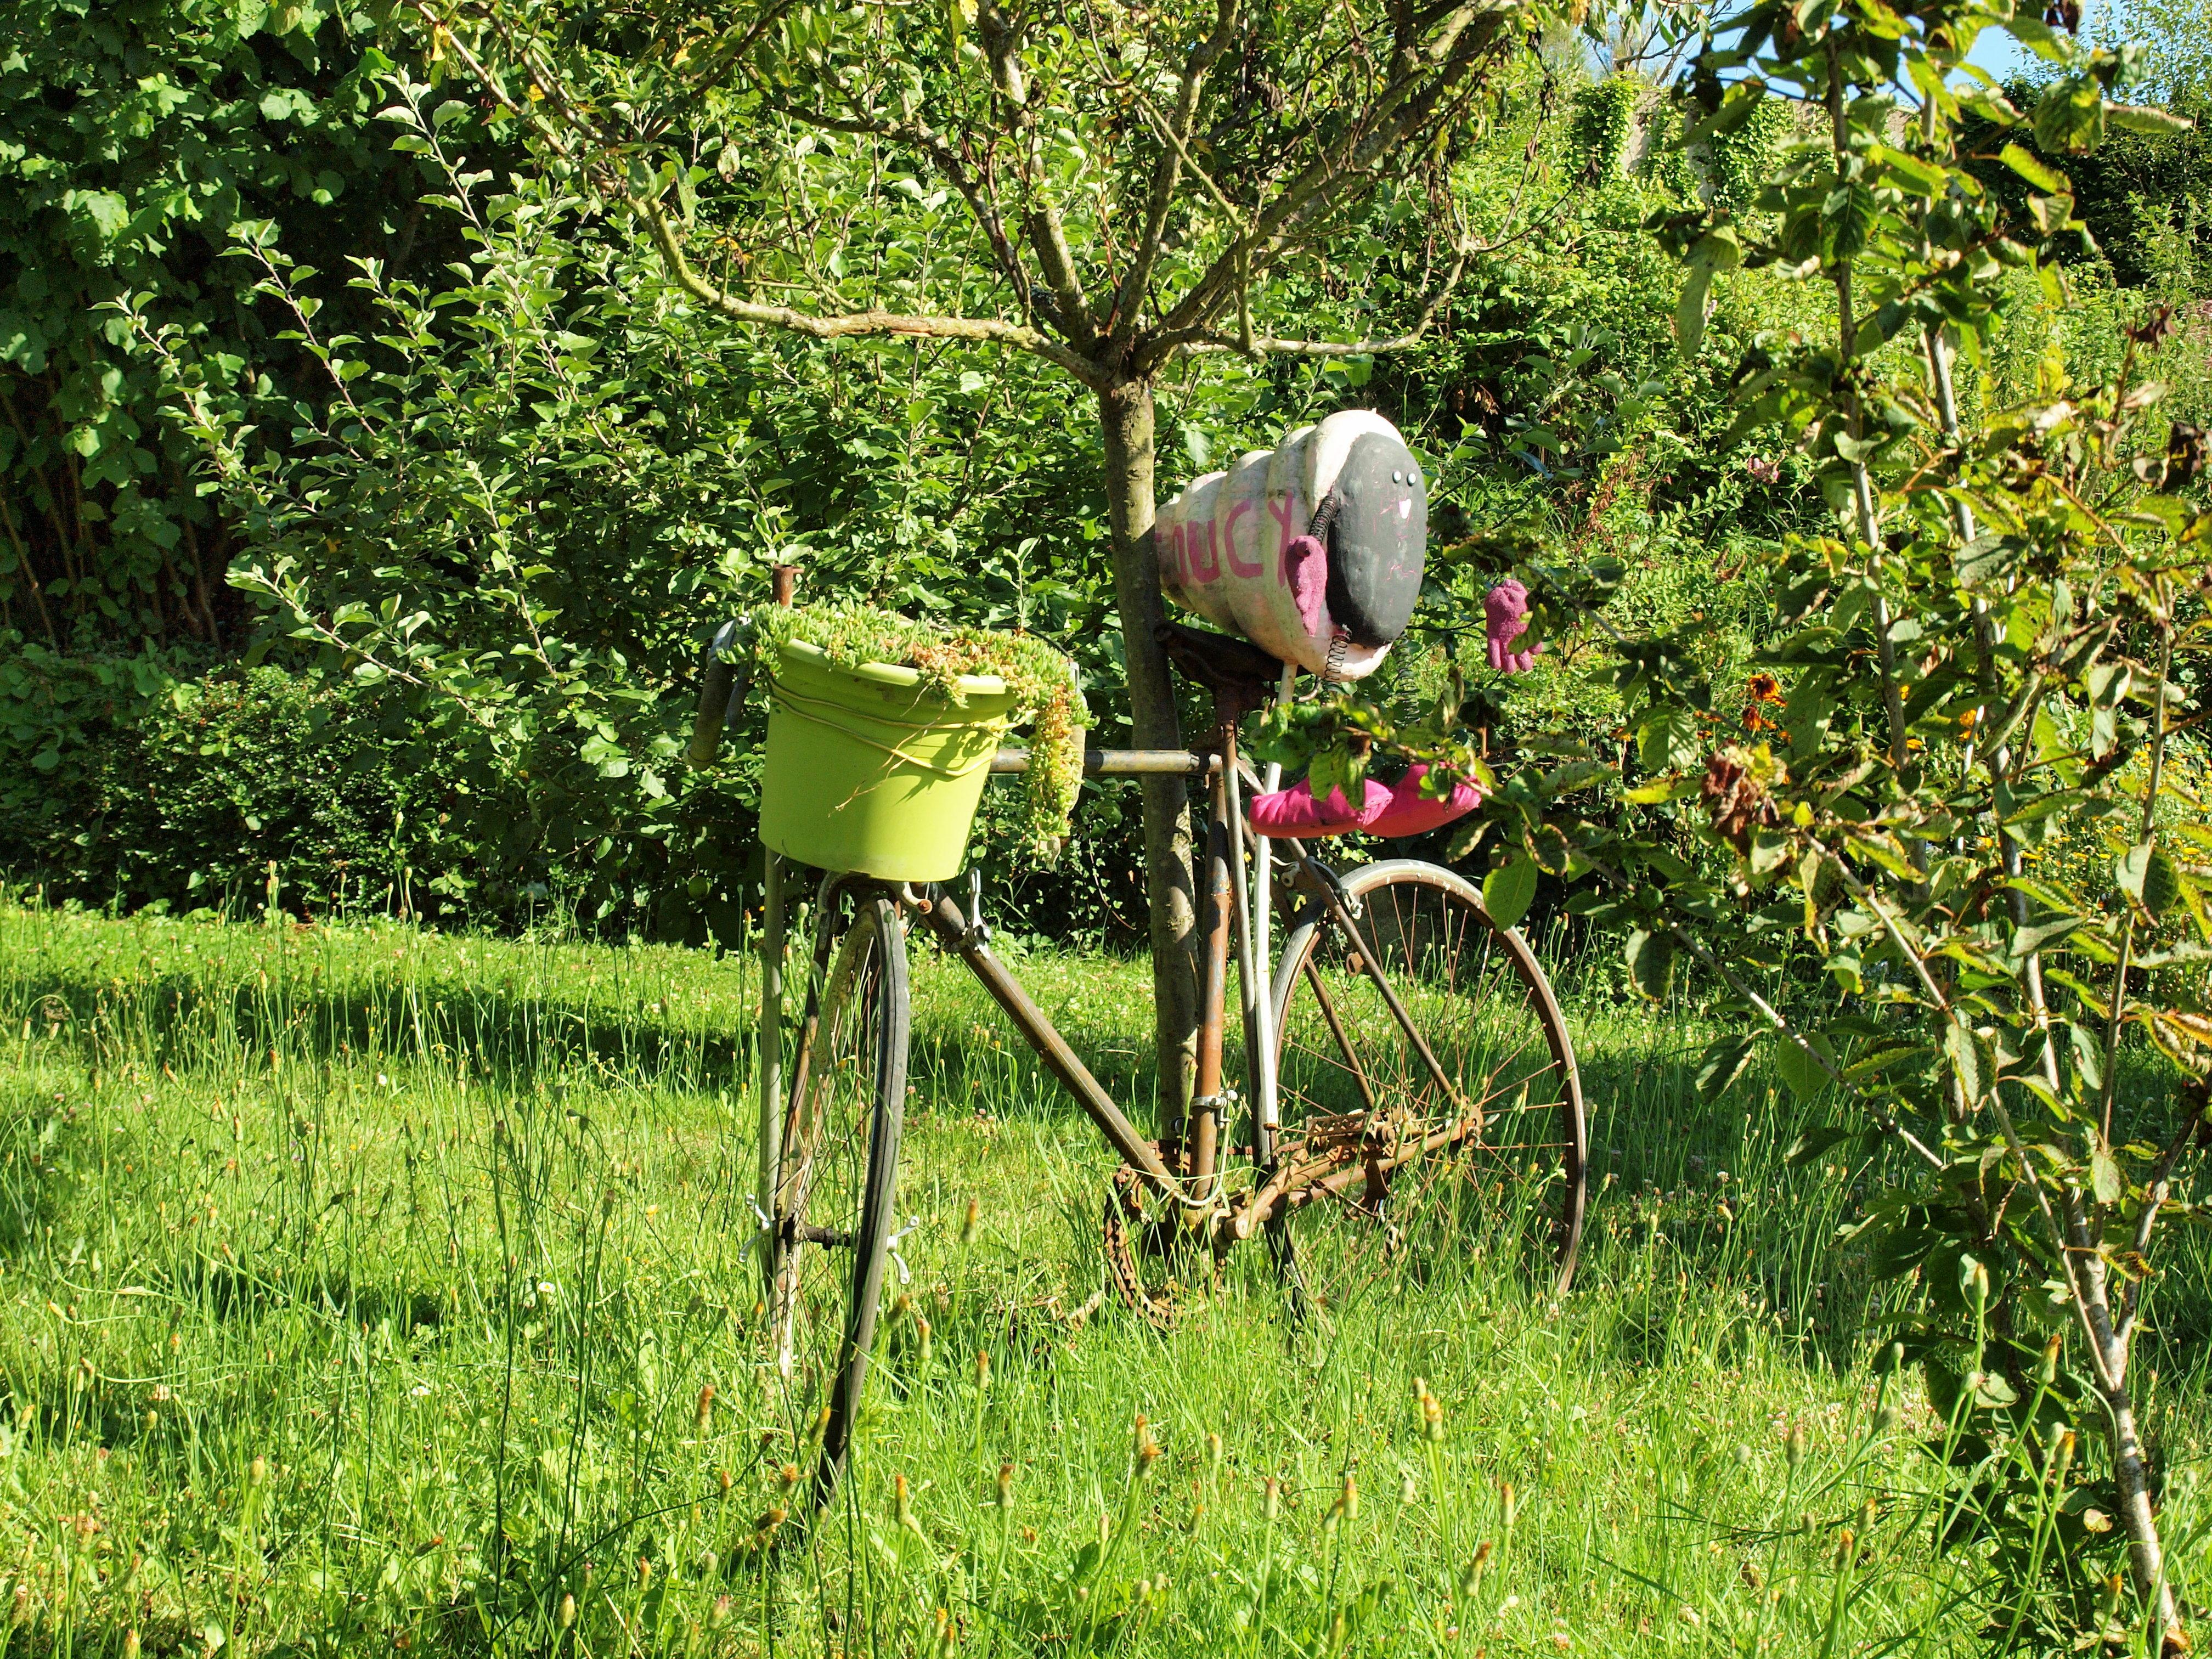 File:Toucy-FR-89-décoration de jardin-3.jpg - Wikimedia Commons